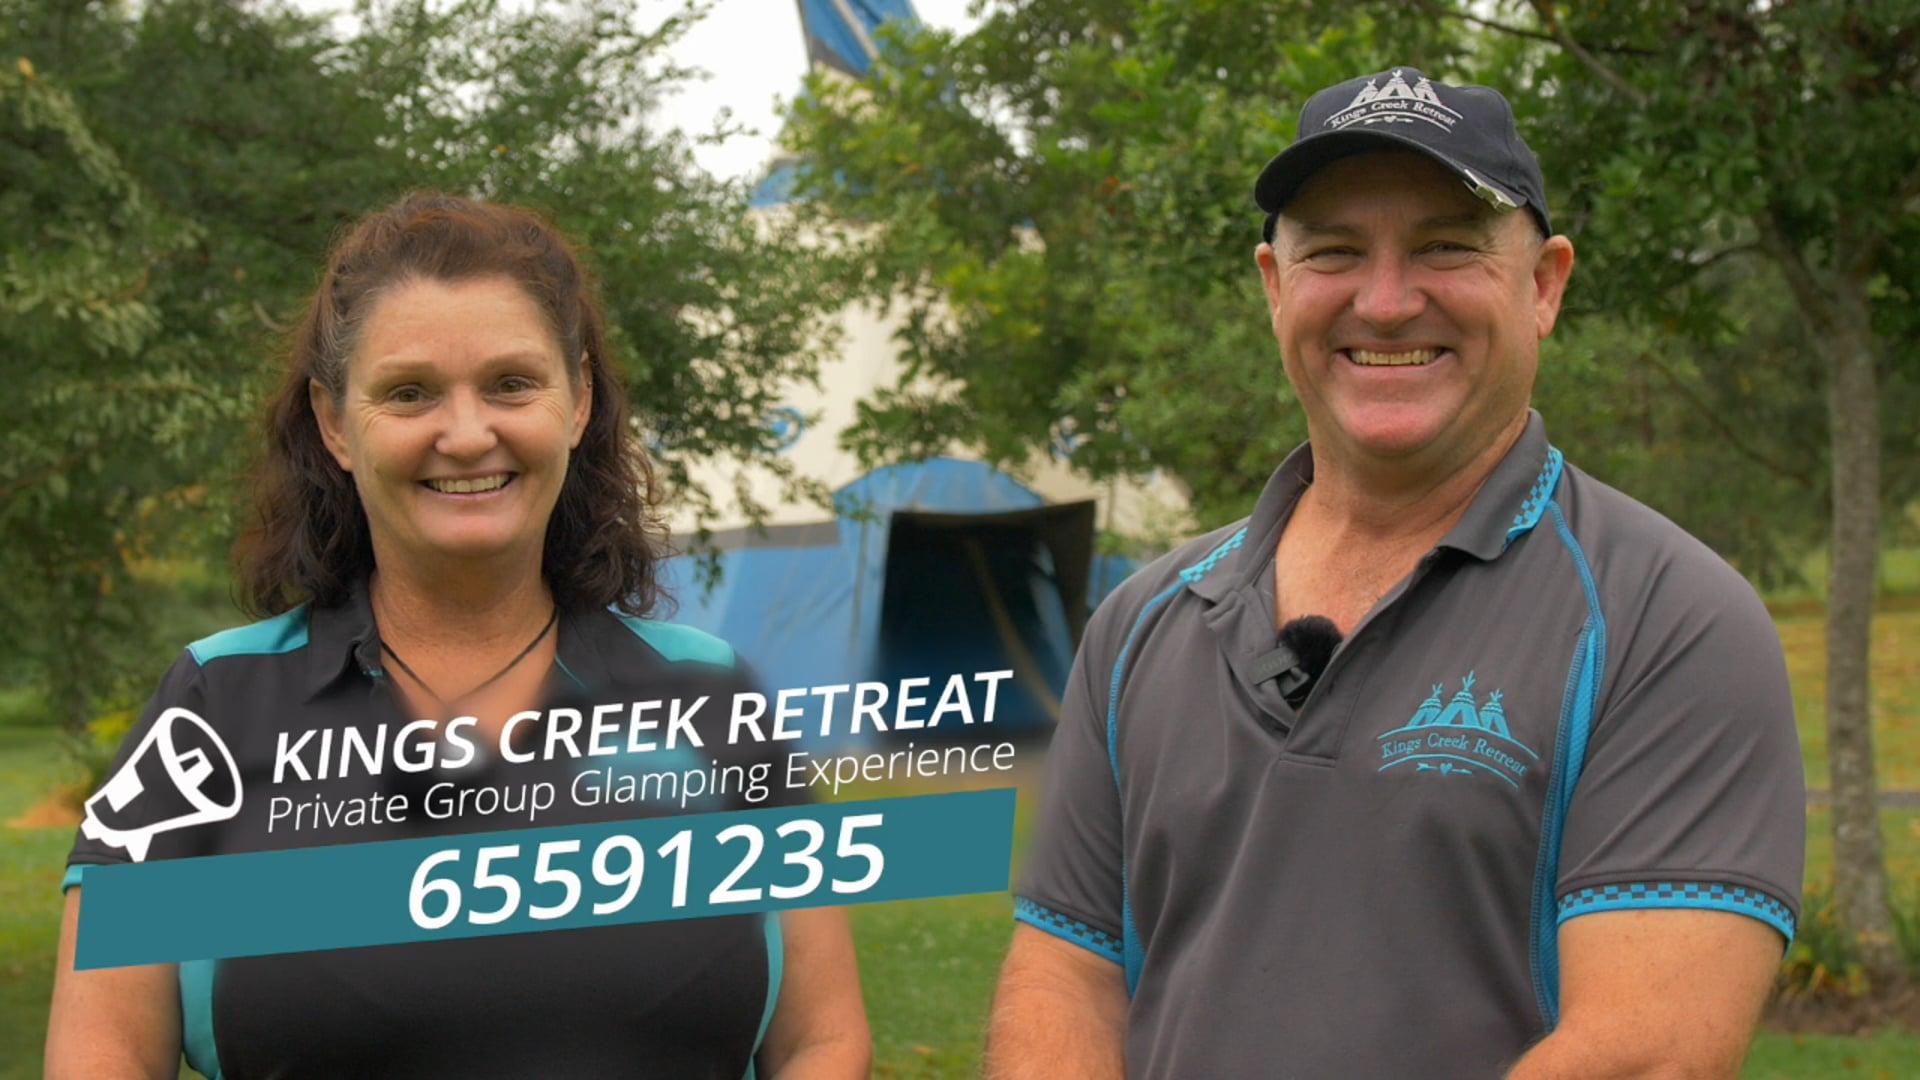 Kings Creek Retreat - Kramback